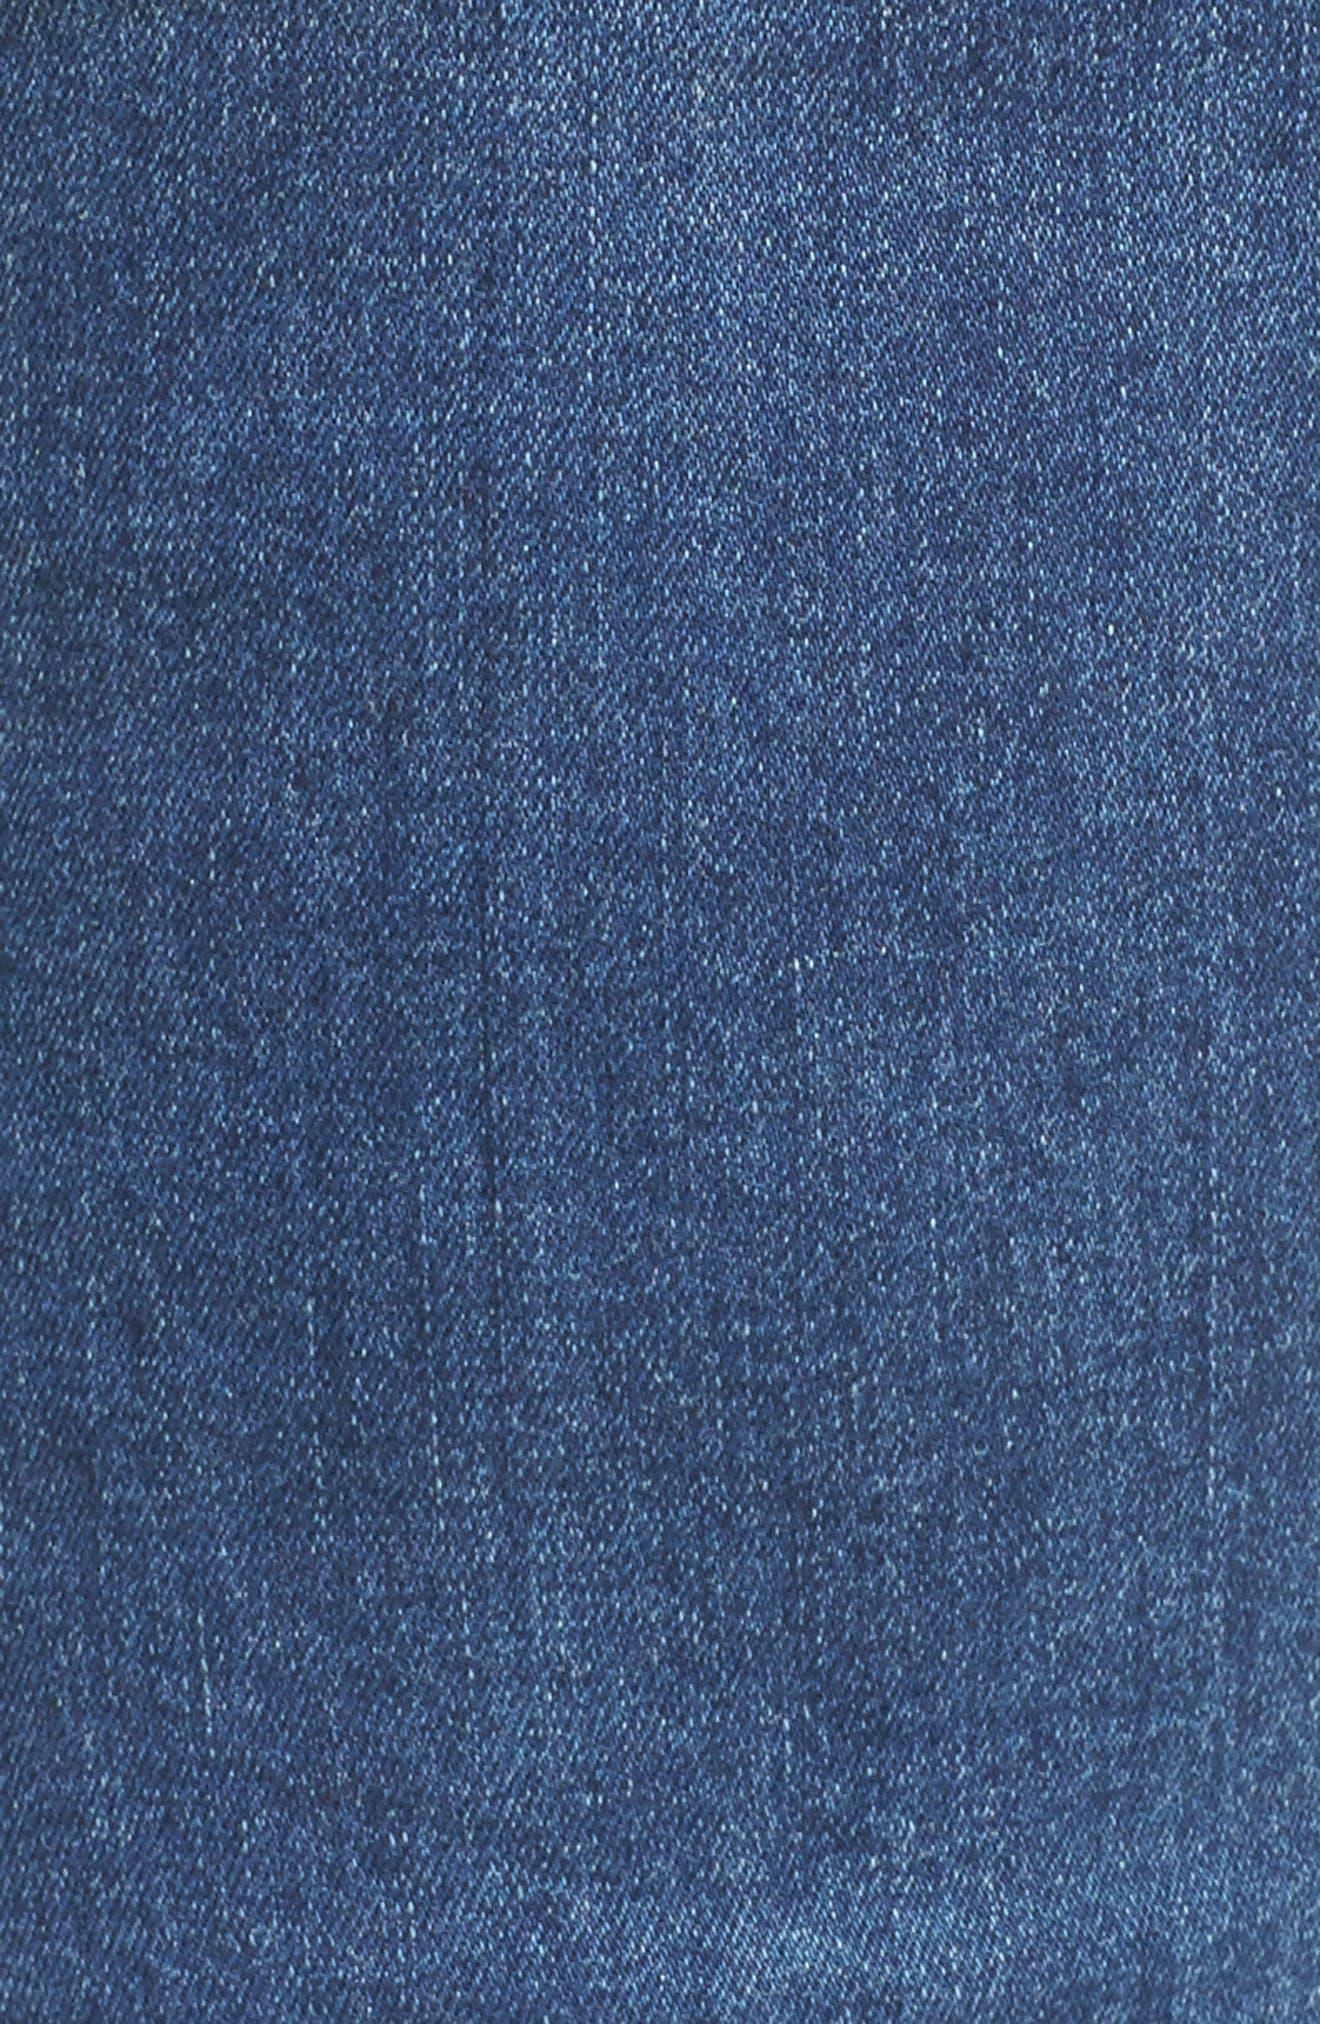 Distressed Slim Raw Hem Cuffed Jeans,                             Alternate thumbnail 5, color,                             426